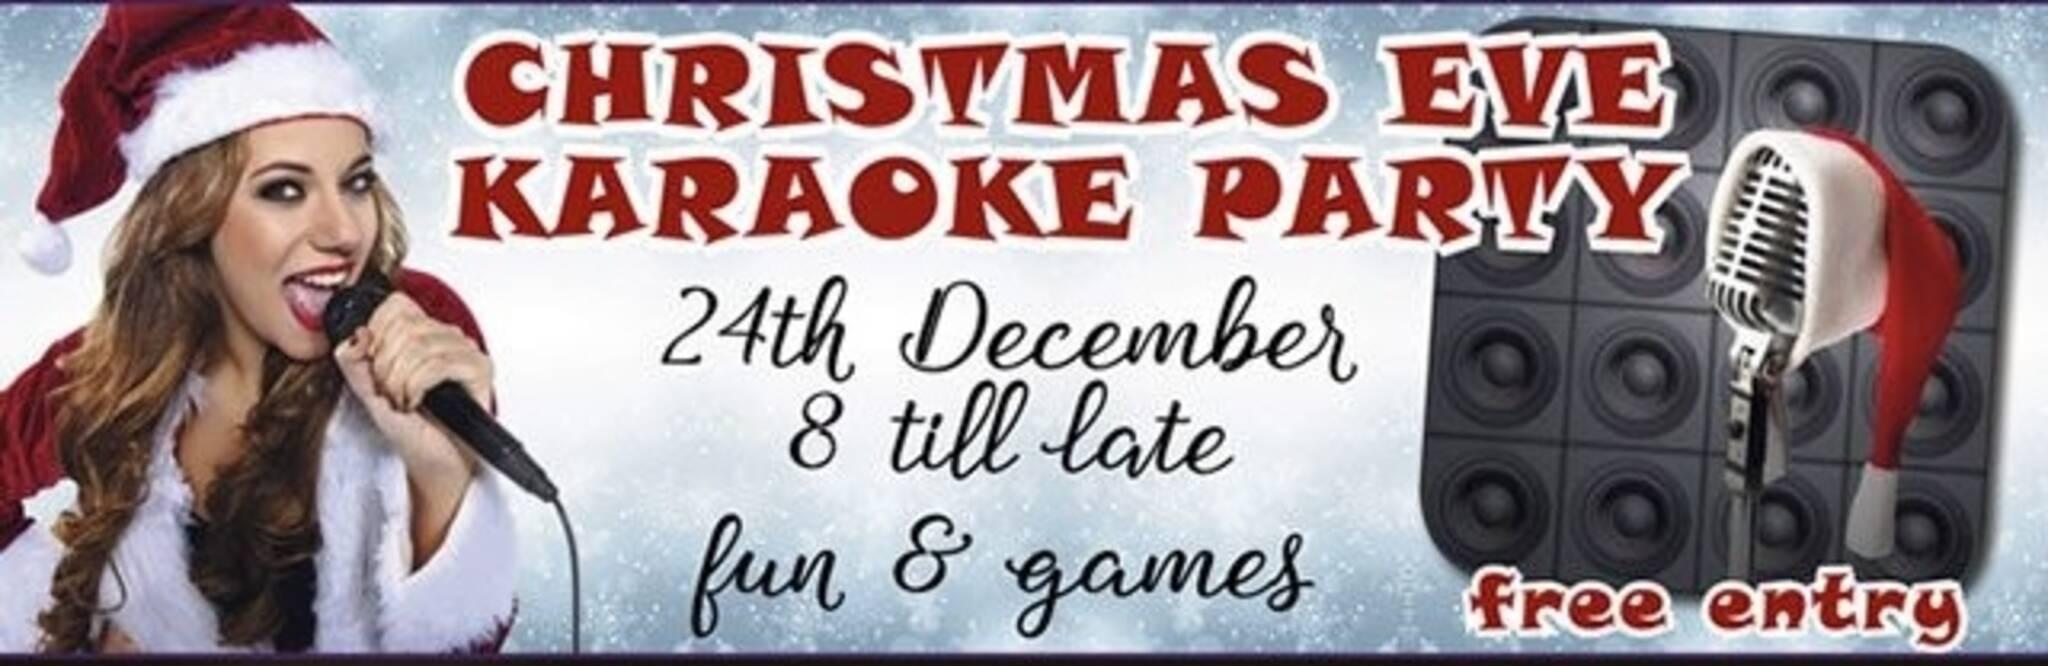 Christmas Eve Karaoke Night - The Office Pub